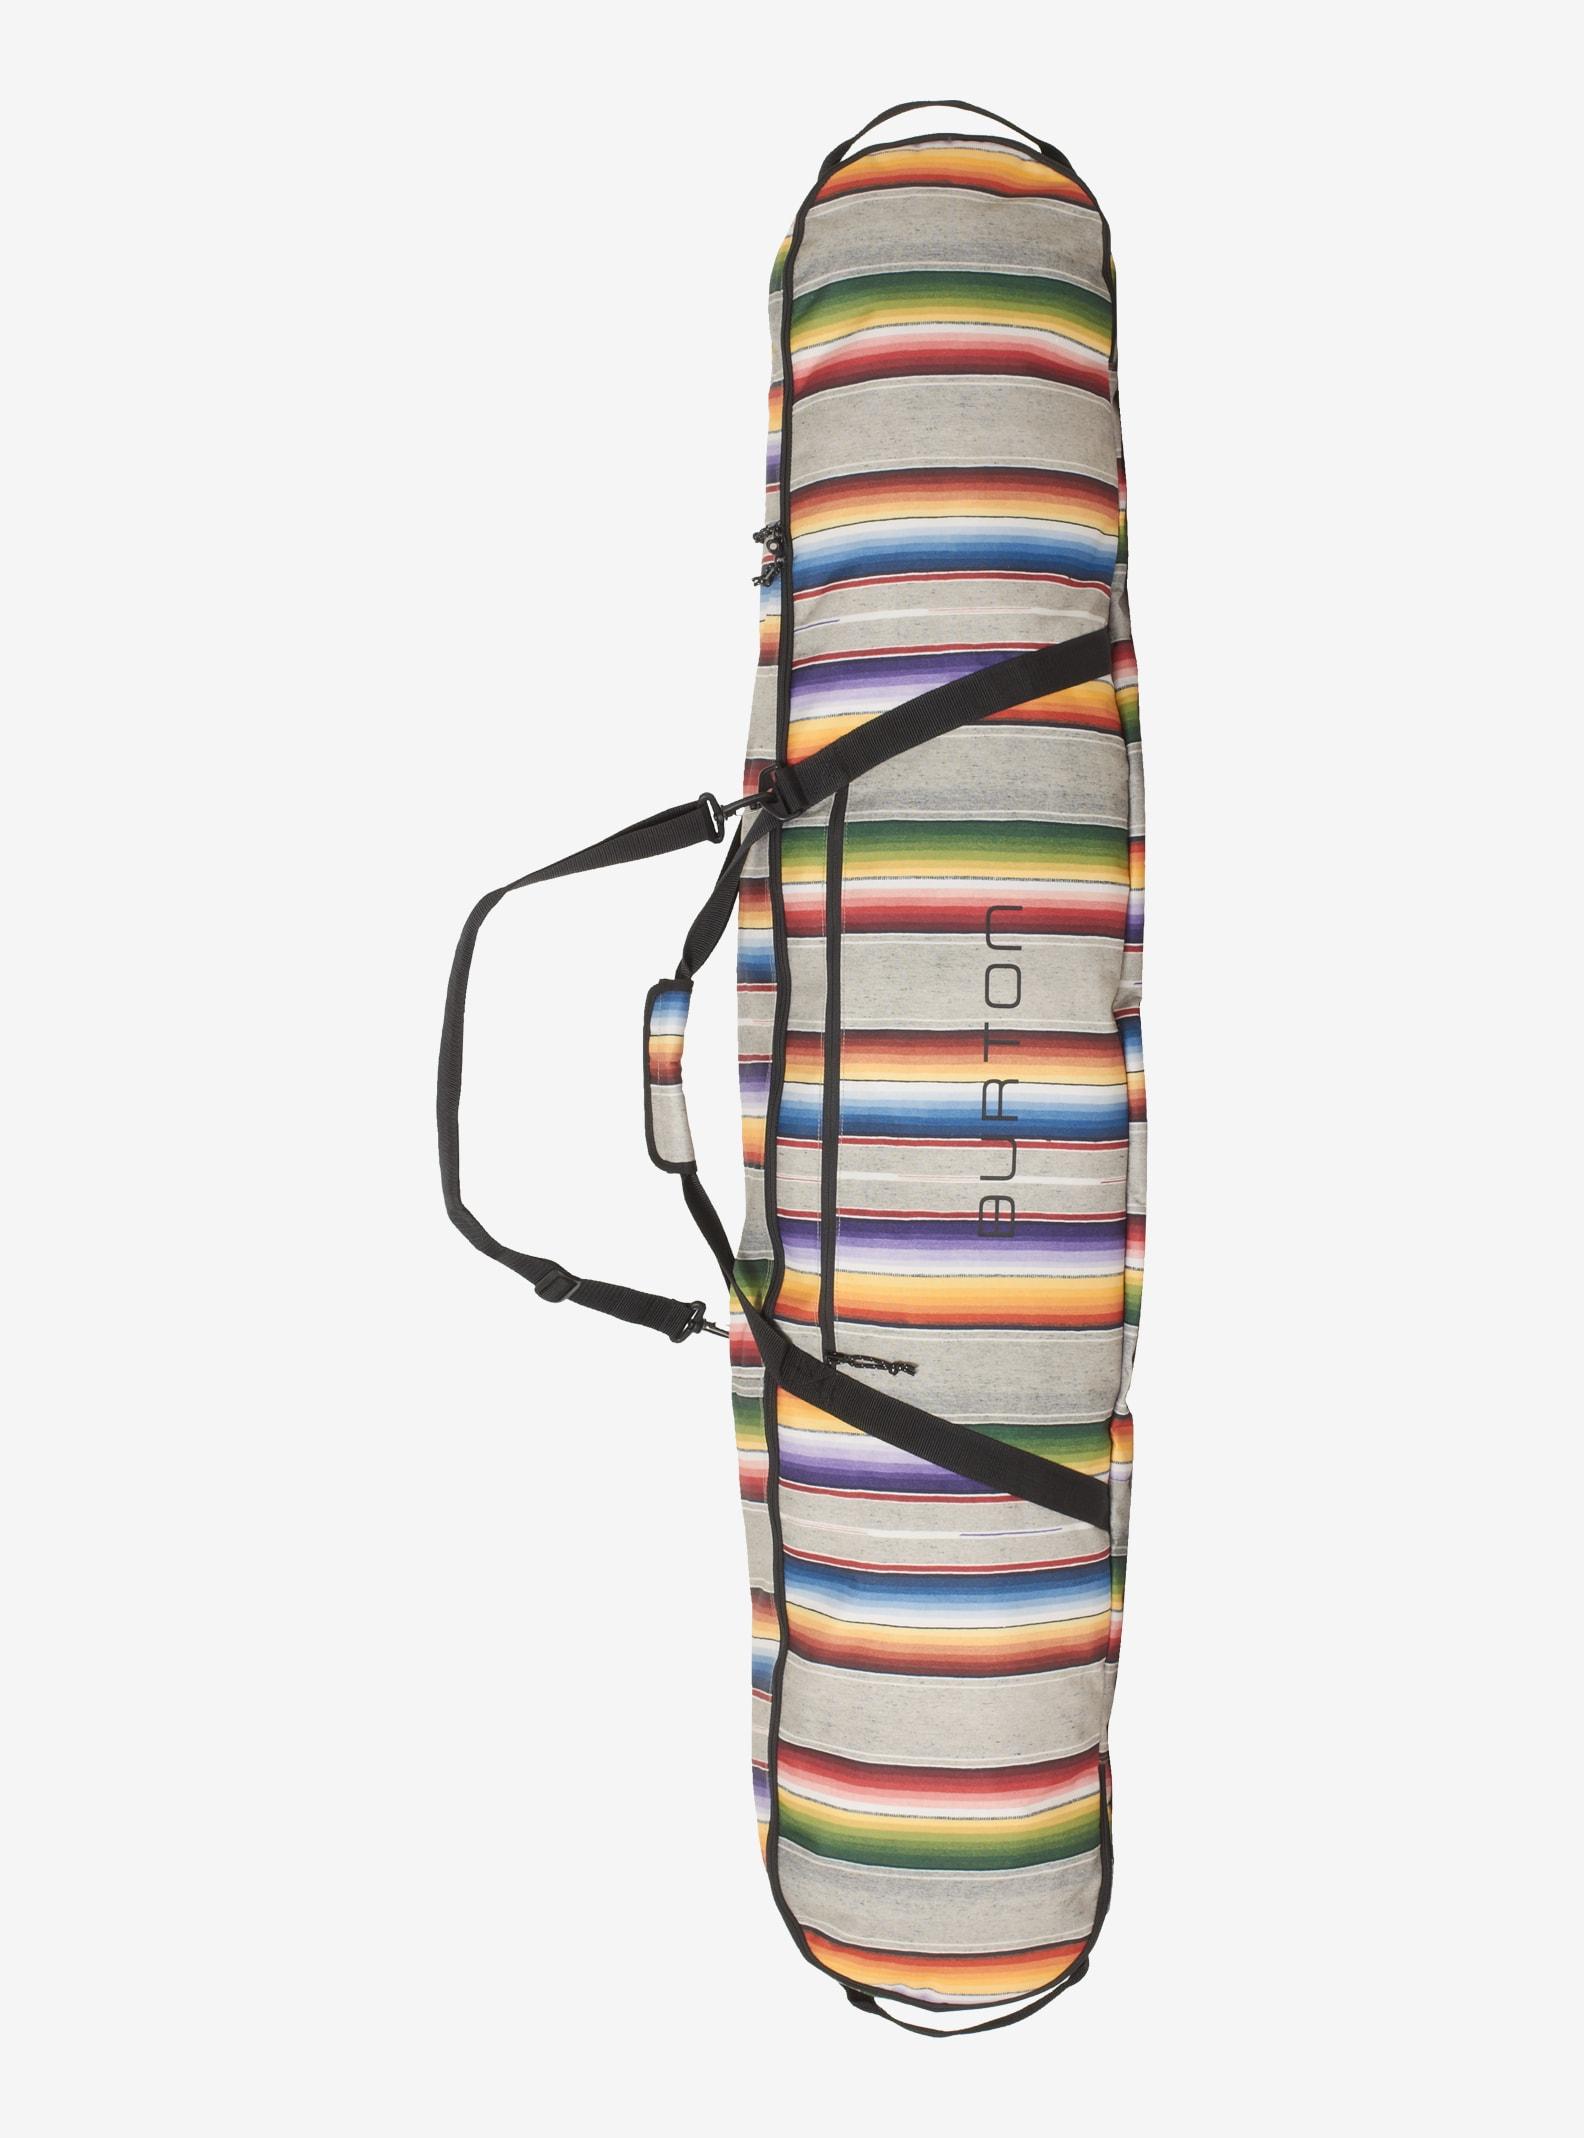 Burton JPN Board Sack shown in Bright Sinola Stripe